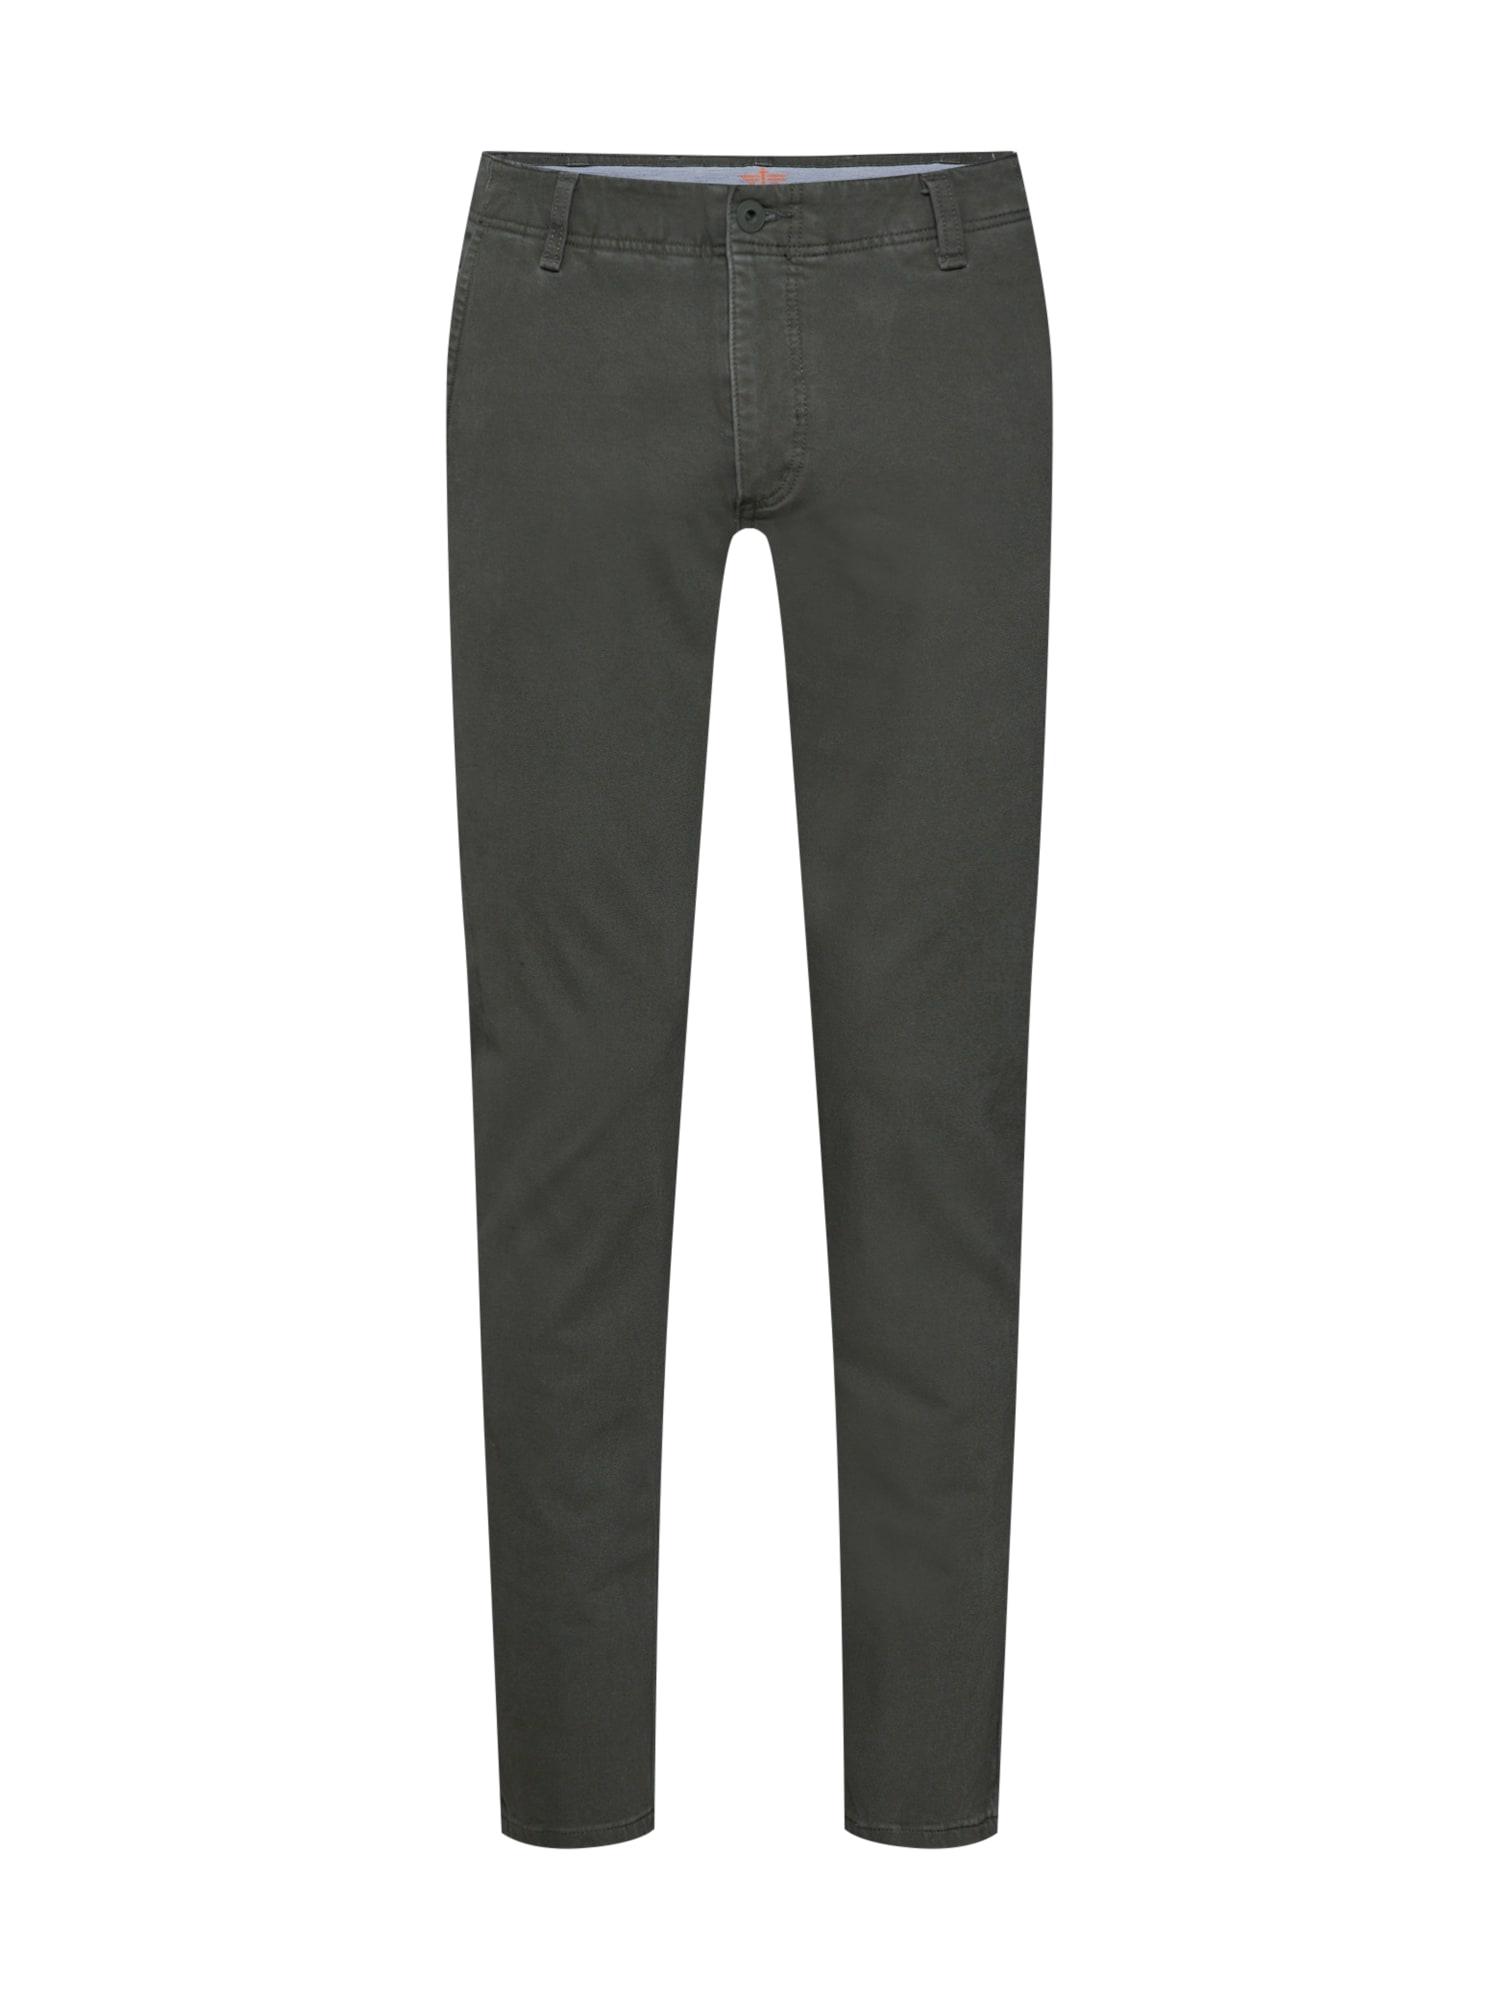 Kalhoty SMART 360 FLEX ALPHA SLIM (TAPERED) olivová Dockers